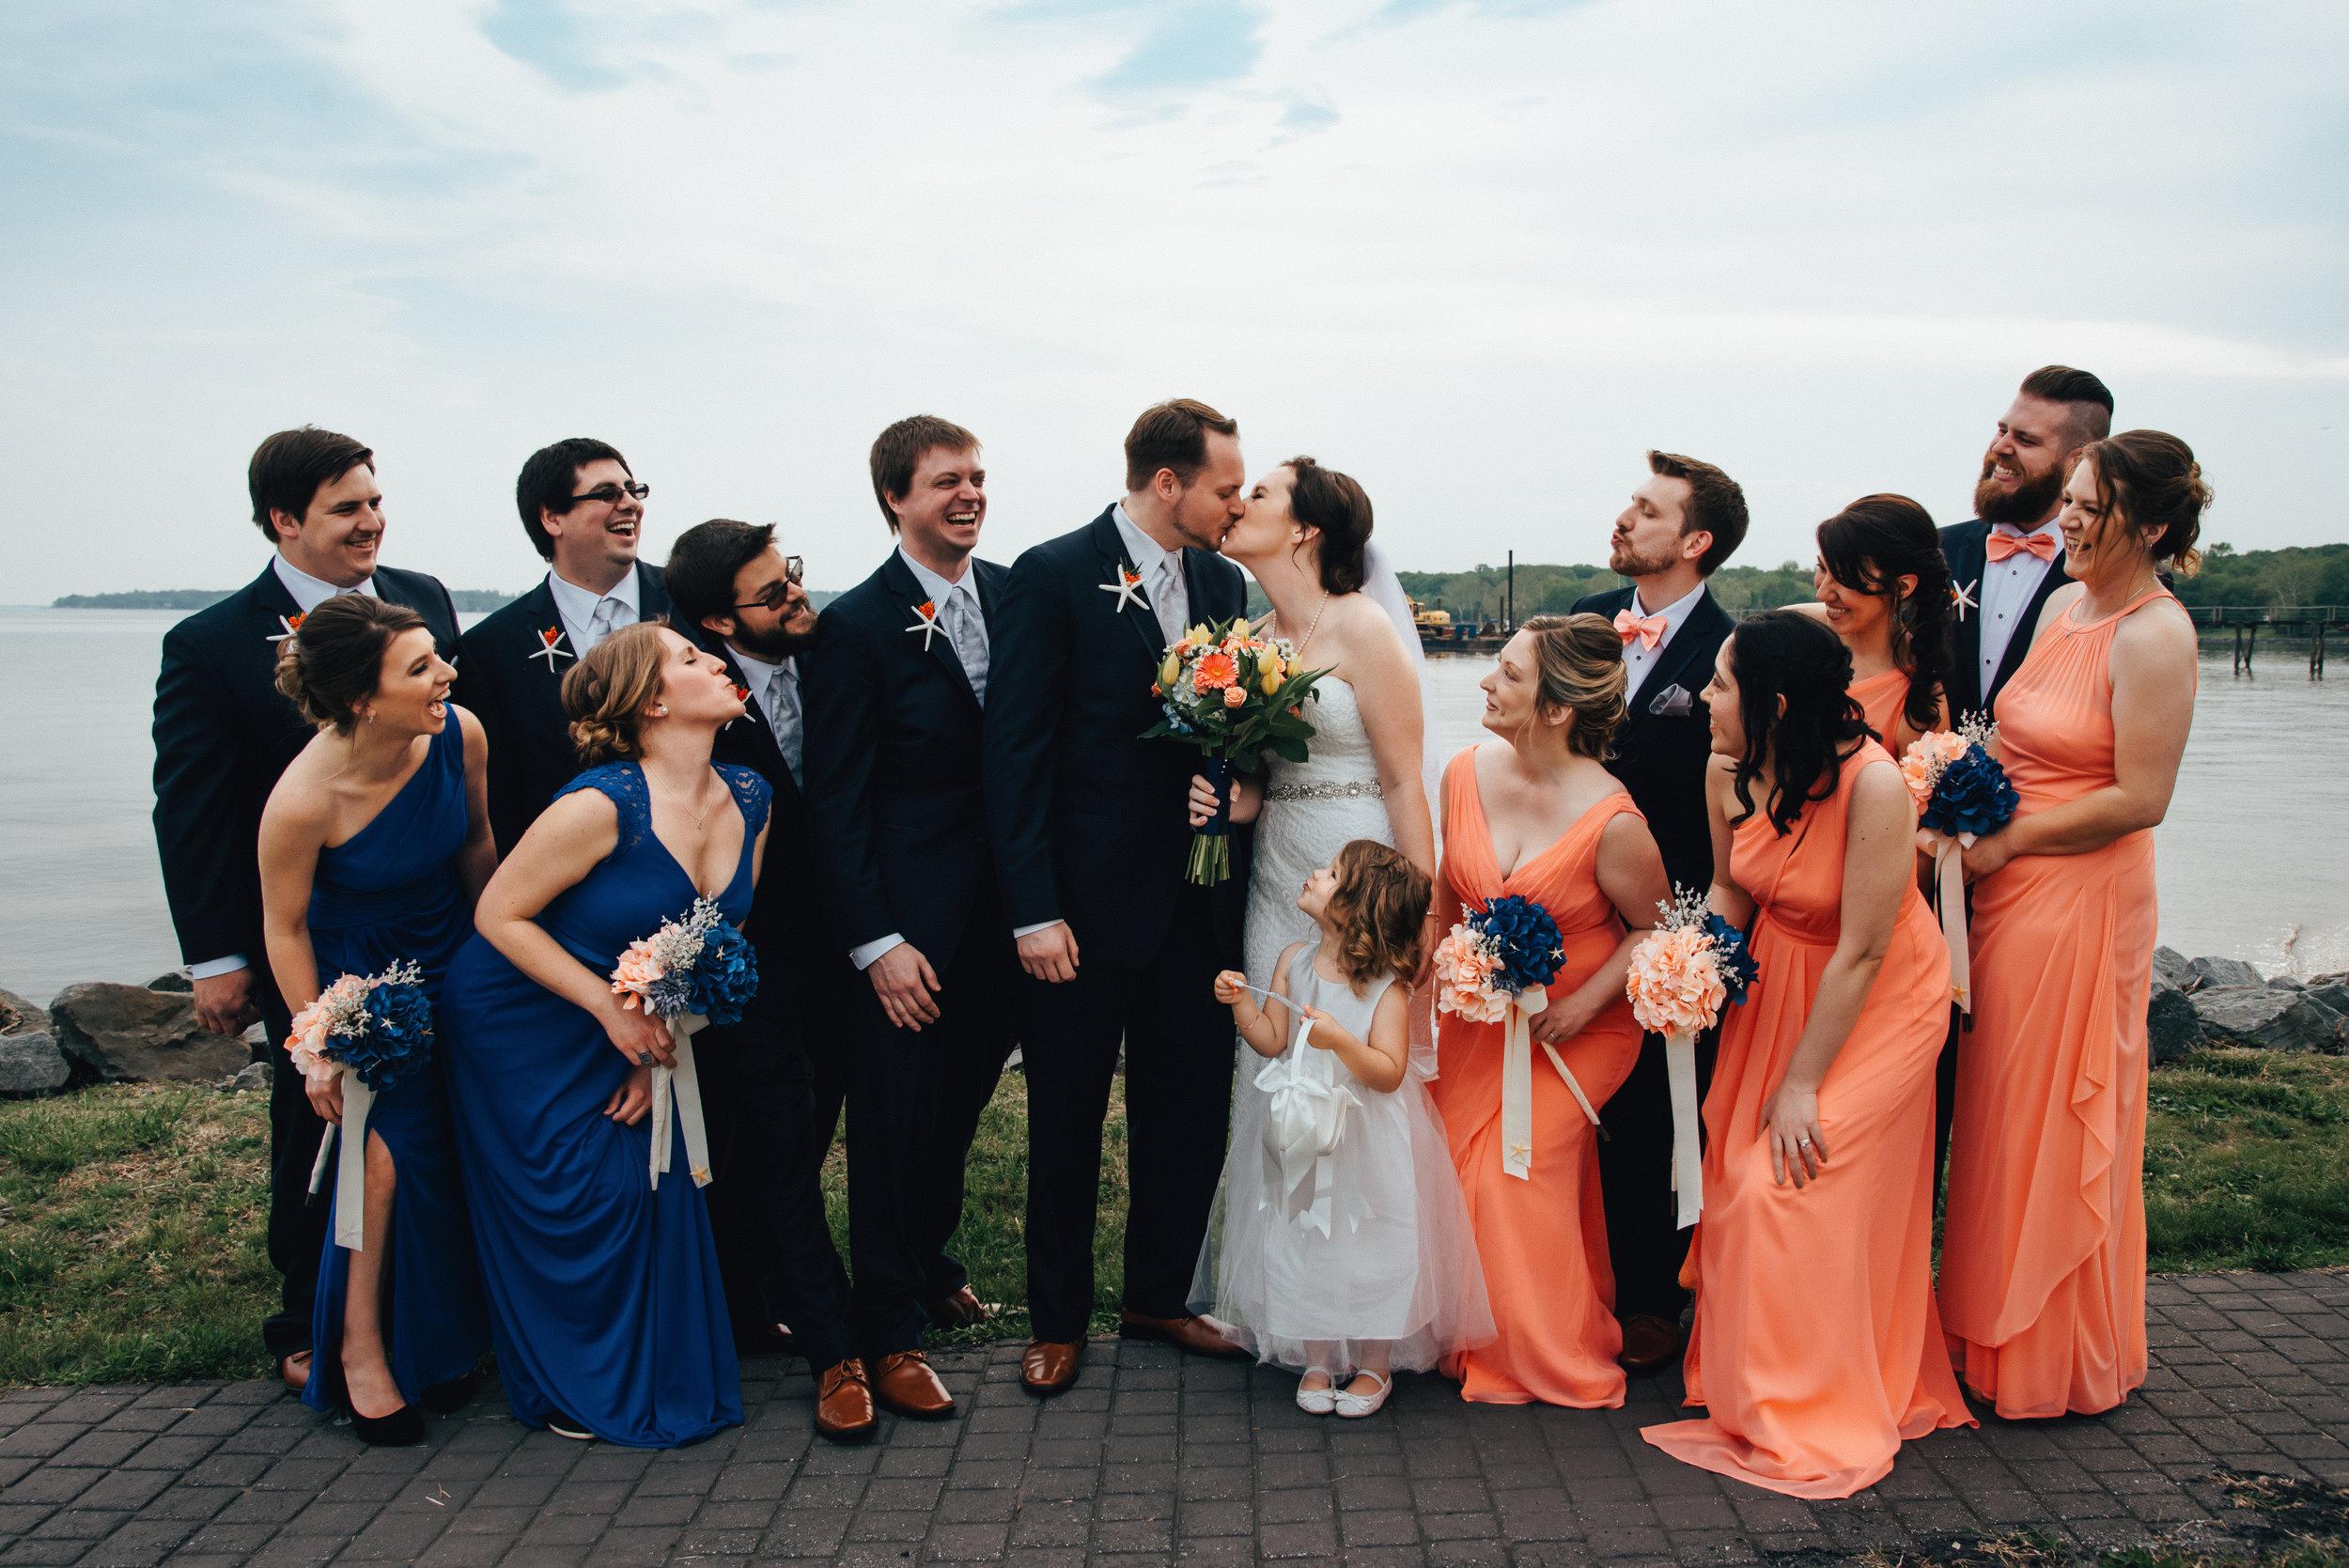 20180828_weddingwebsite_small_70.jpg